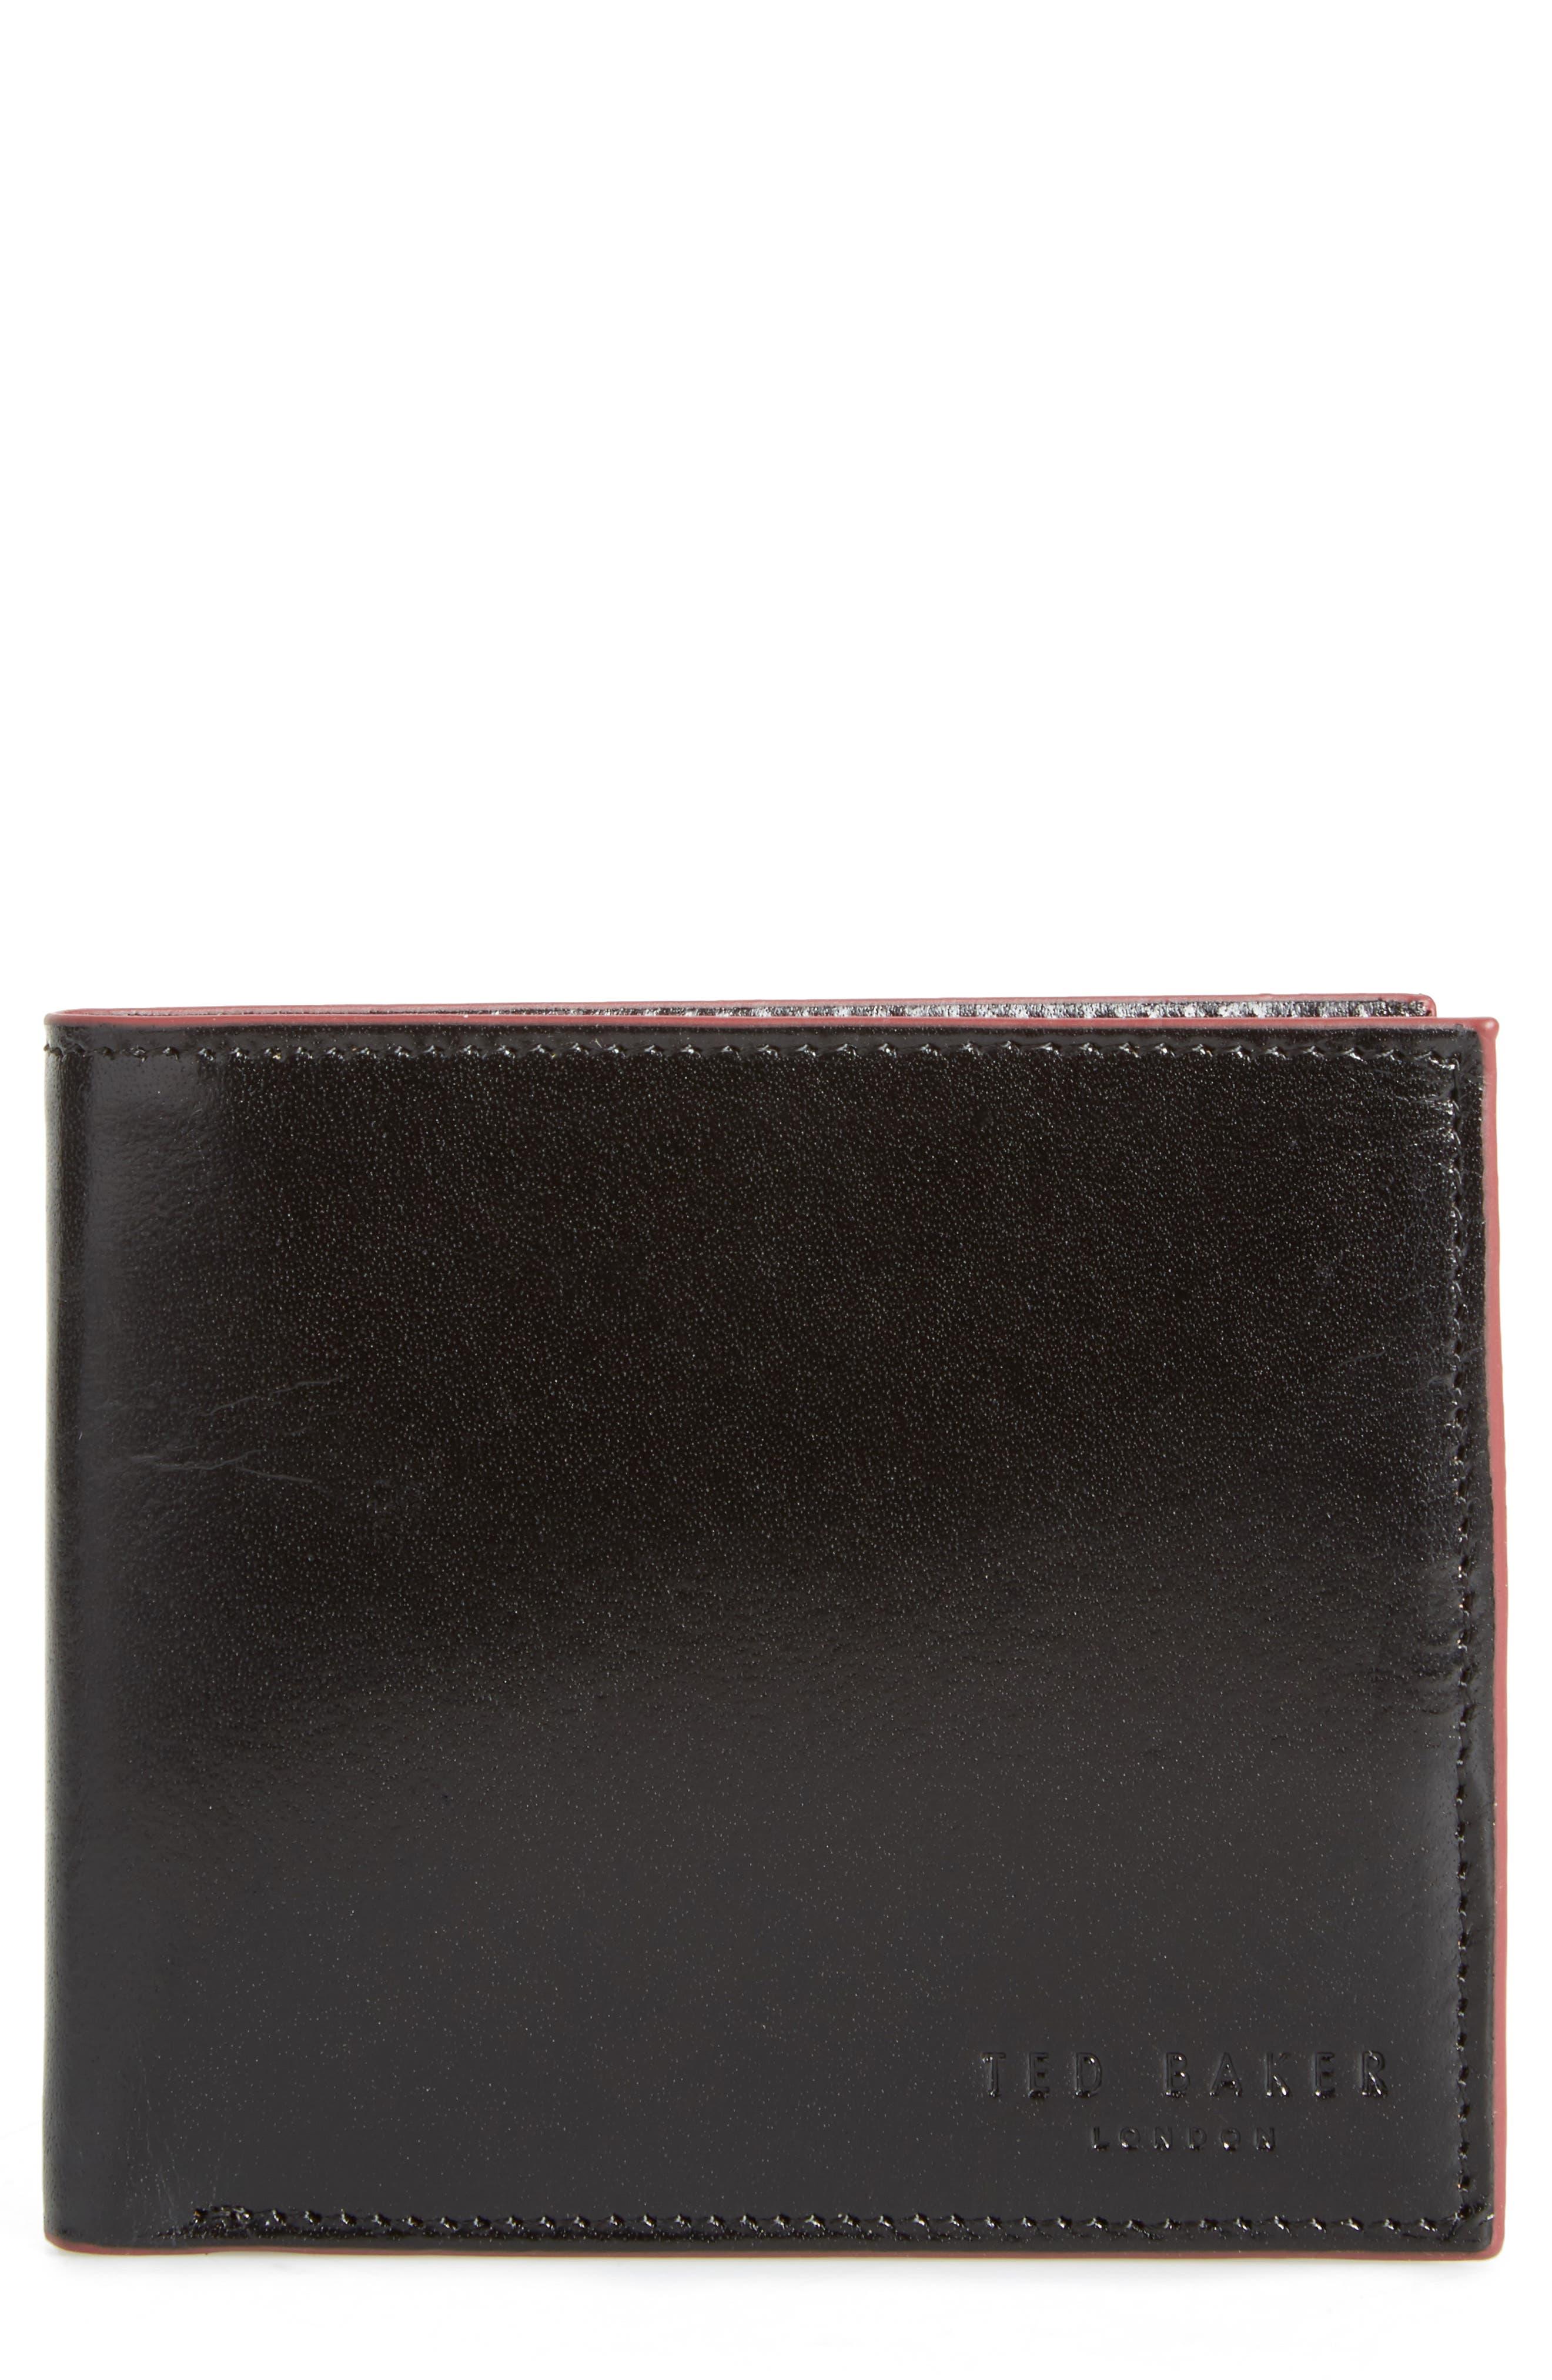 Loganz Leather Wallet,                         Main,                         color, Black